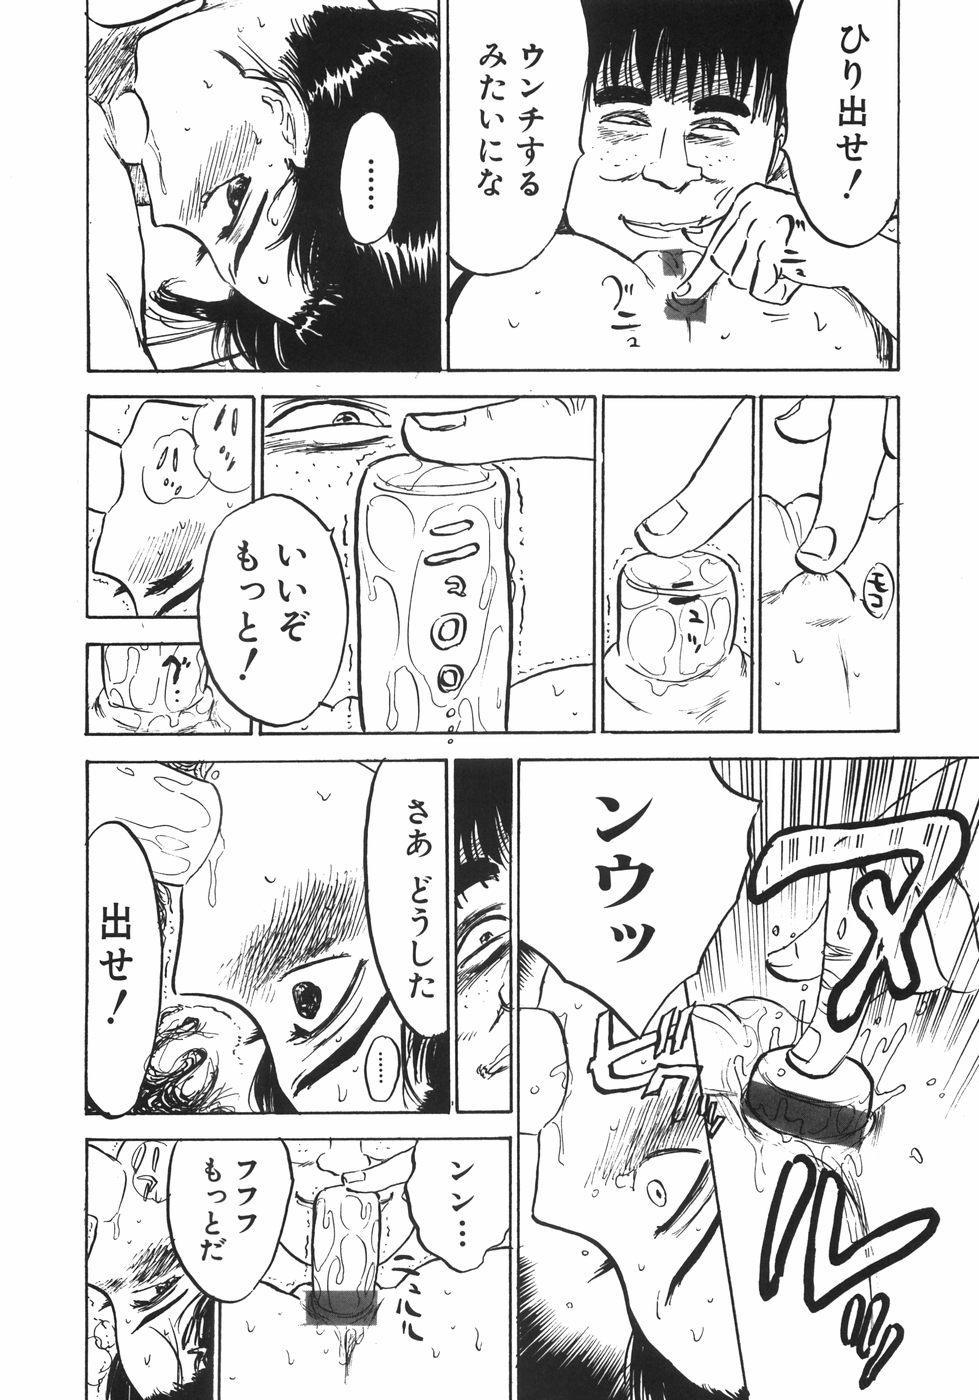 Ningyou no Yakata - The Doll House 38